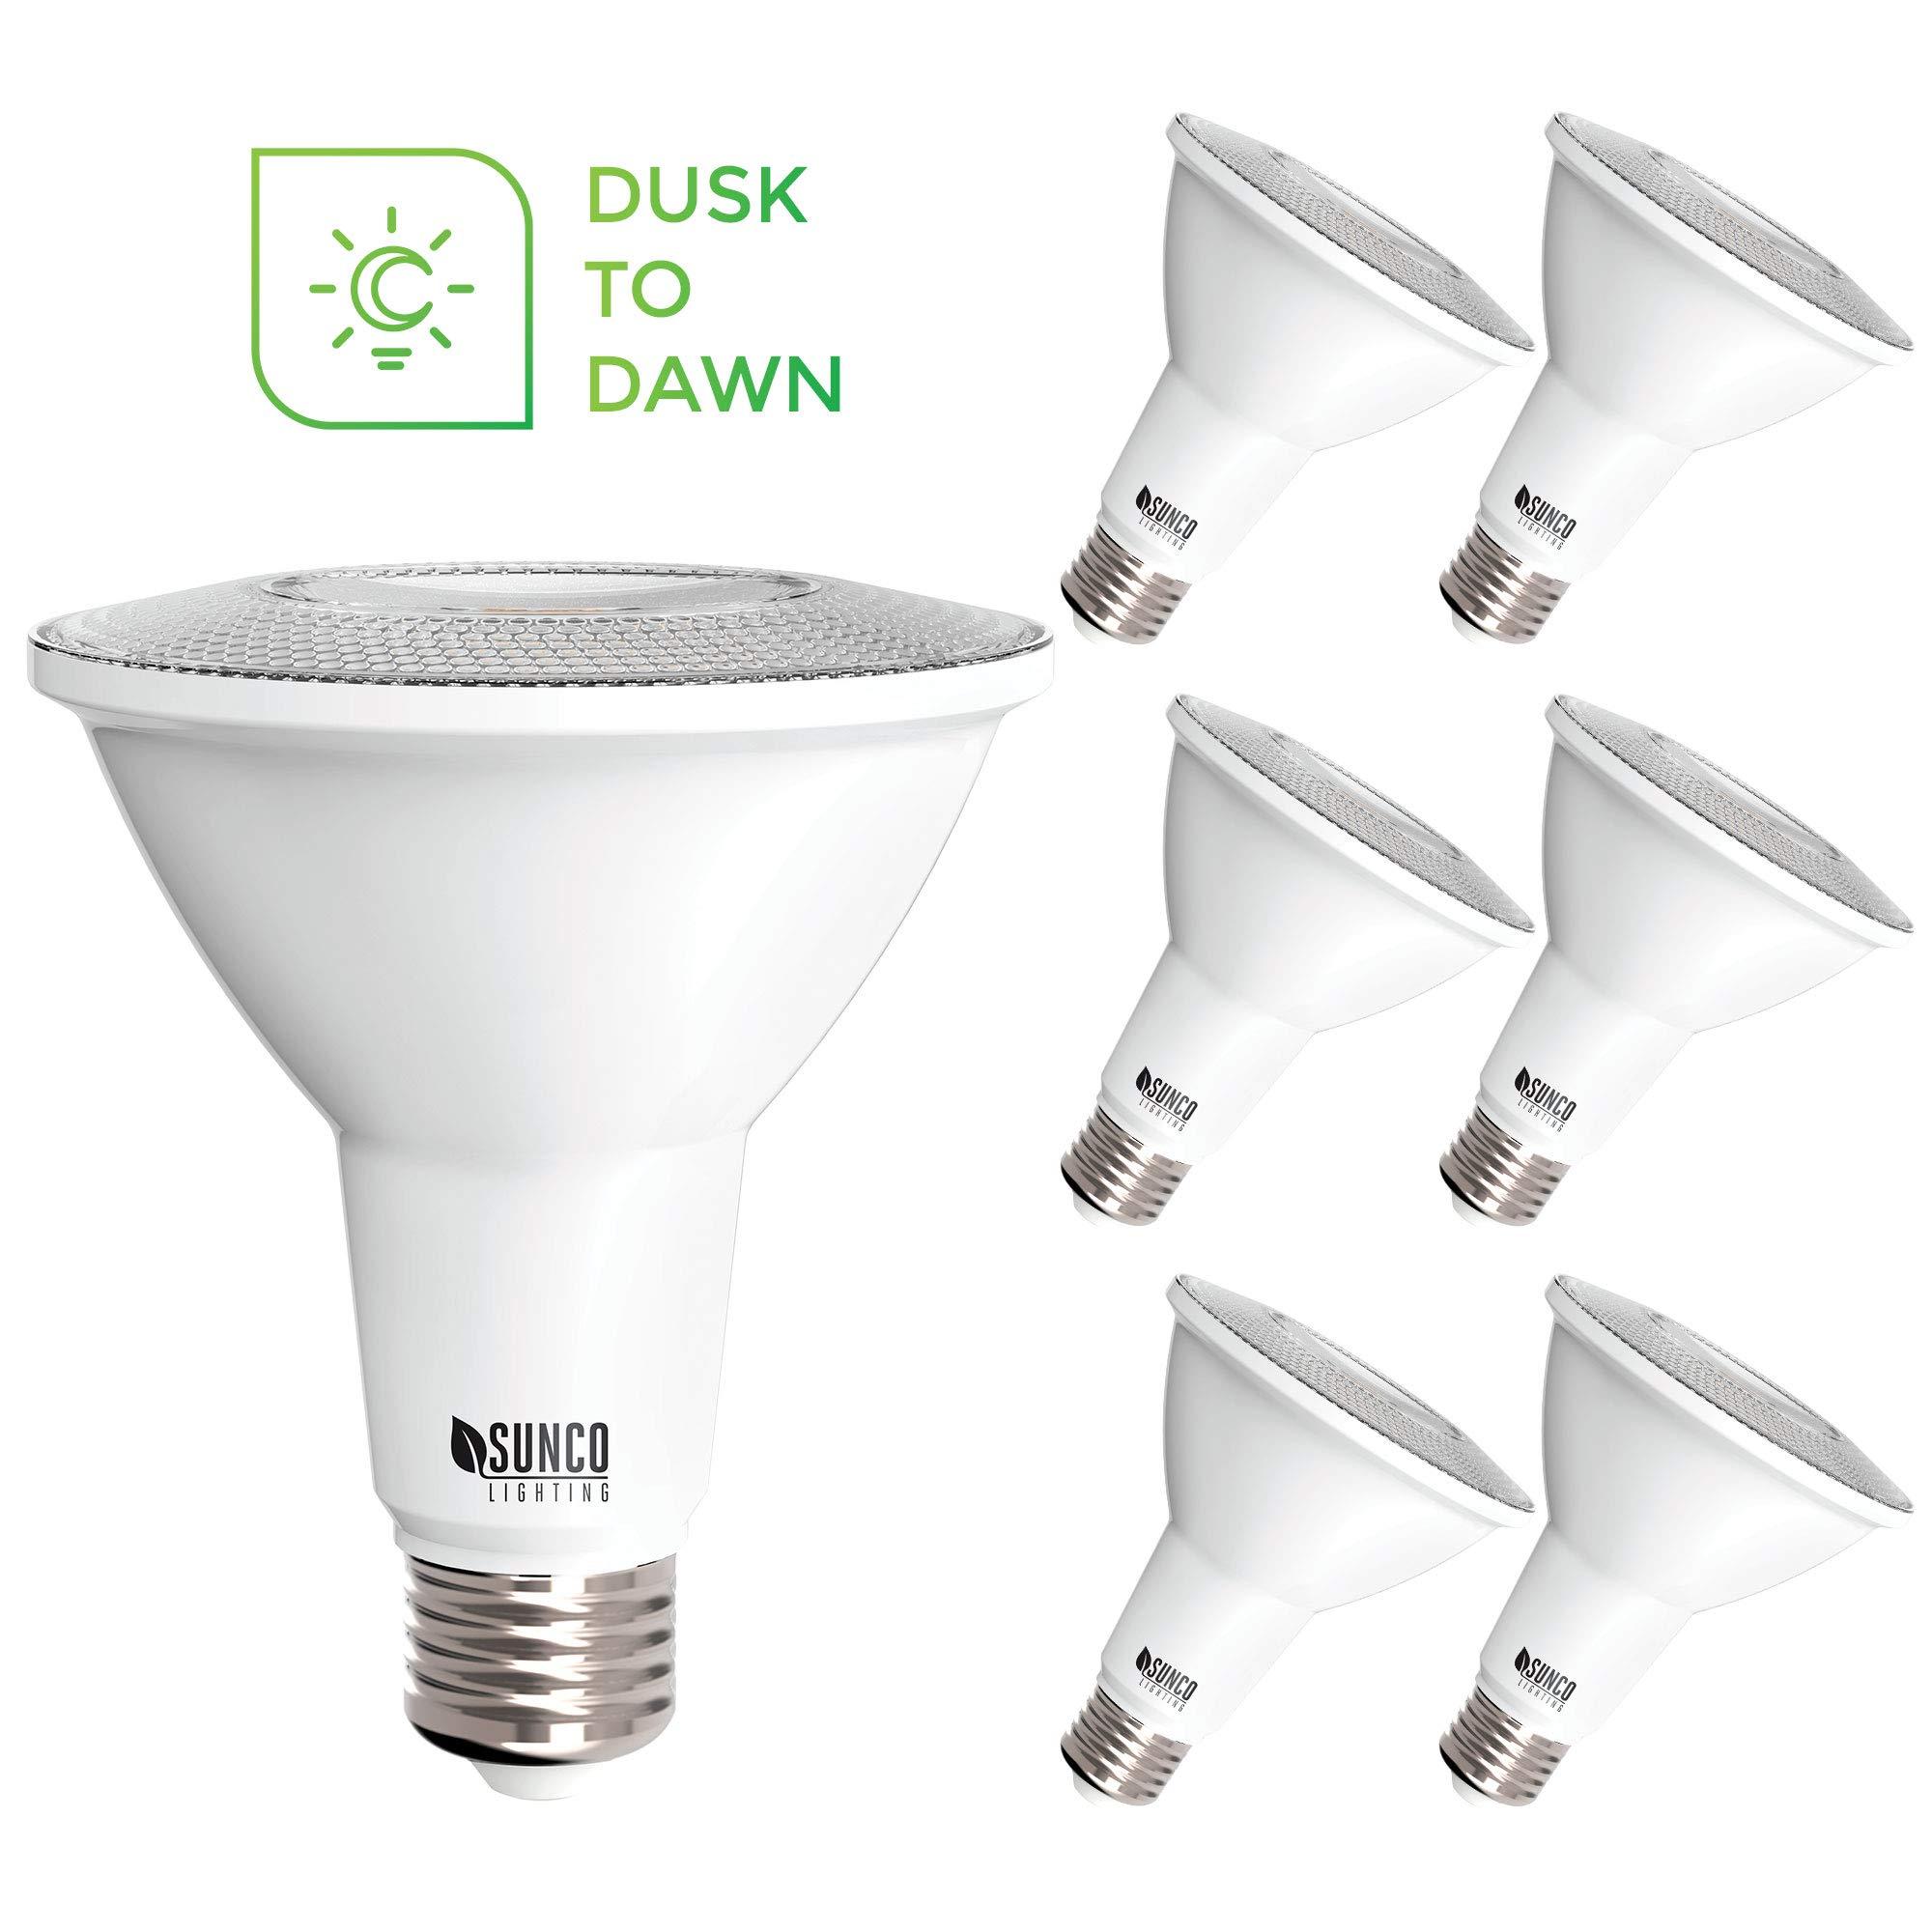 Sunco Lighting 6 Pack PAR30 LED Bulb, Dusk-to-Dawn Photocell Sensor, 11W=75W, 2700K Soft White, 850 LM, Auto On/Off Security Flood Light - UL